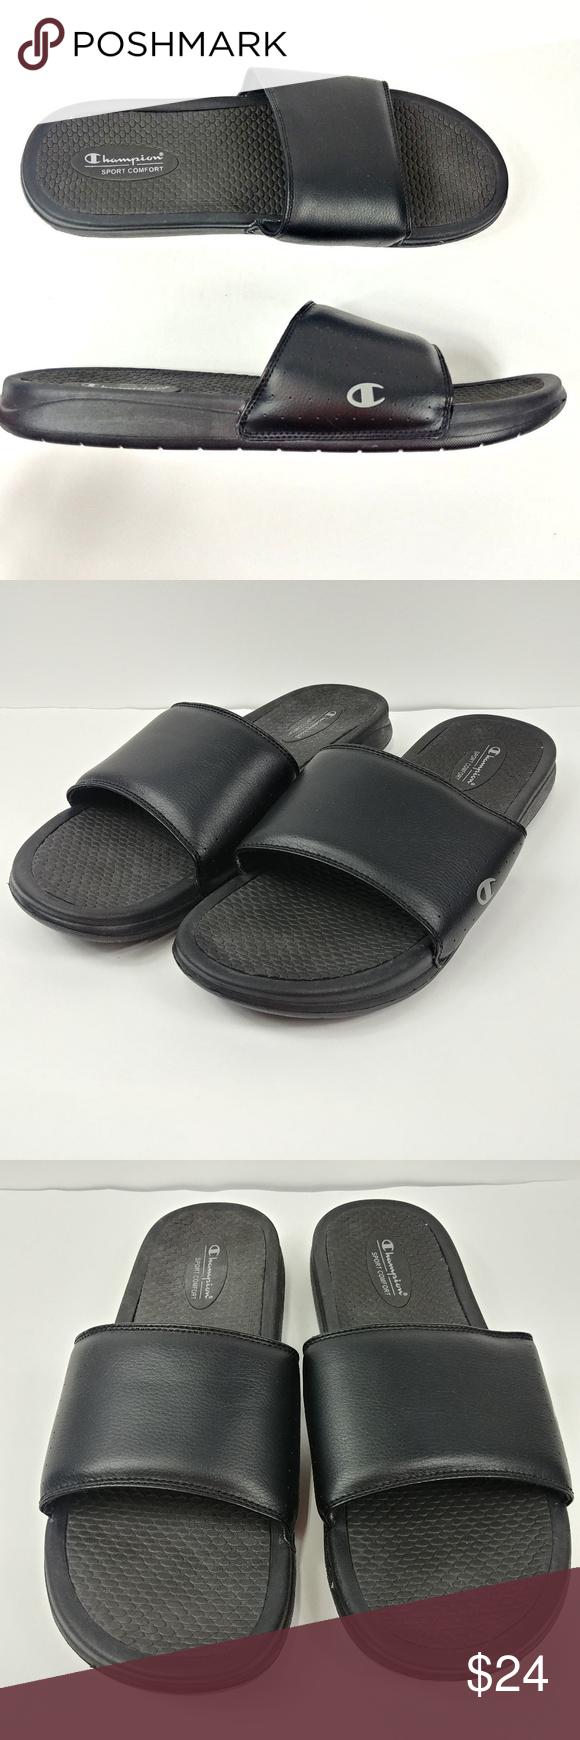 88b2272dbf8 Champion Mens Slides Sandals Flip Flops Sz 14 Champion Mens Slides Sandals  Flip Flops Sz 14 Black Gray Solid Sport Comfort C C14 19  P  3.48  L43   19-18 ...